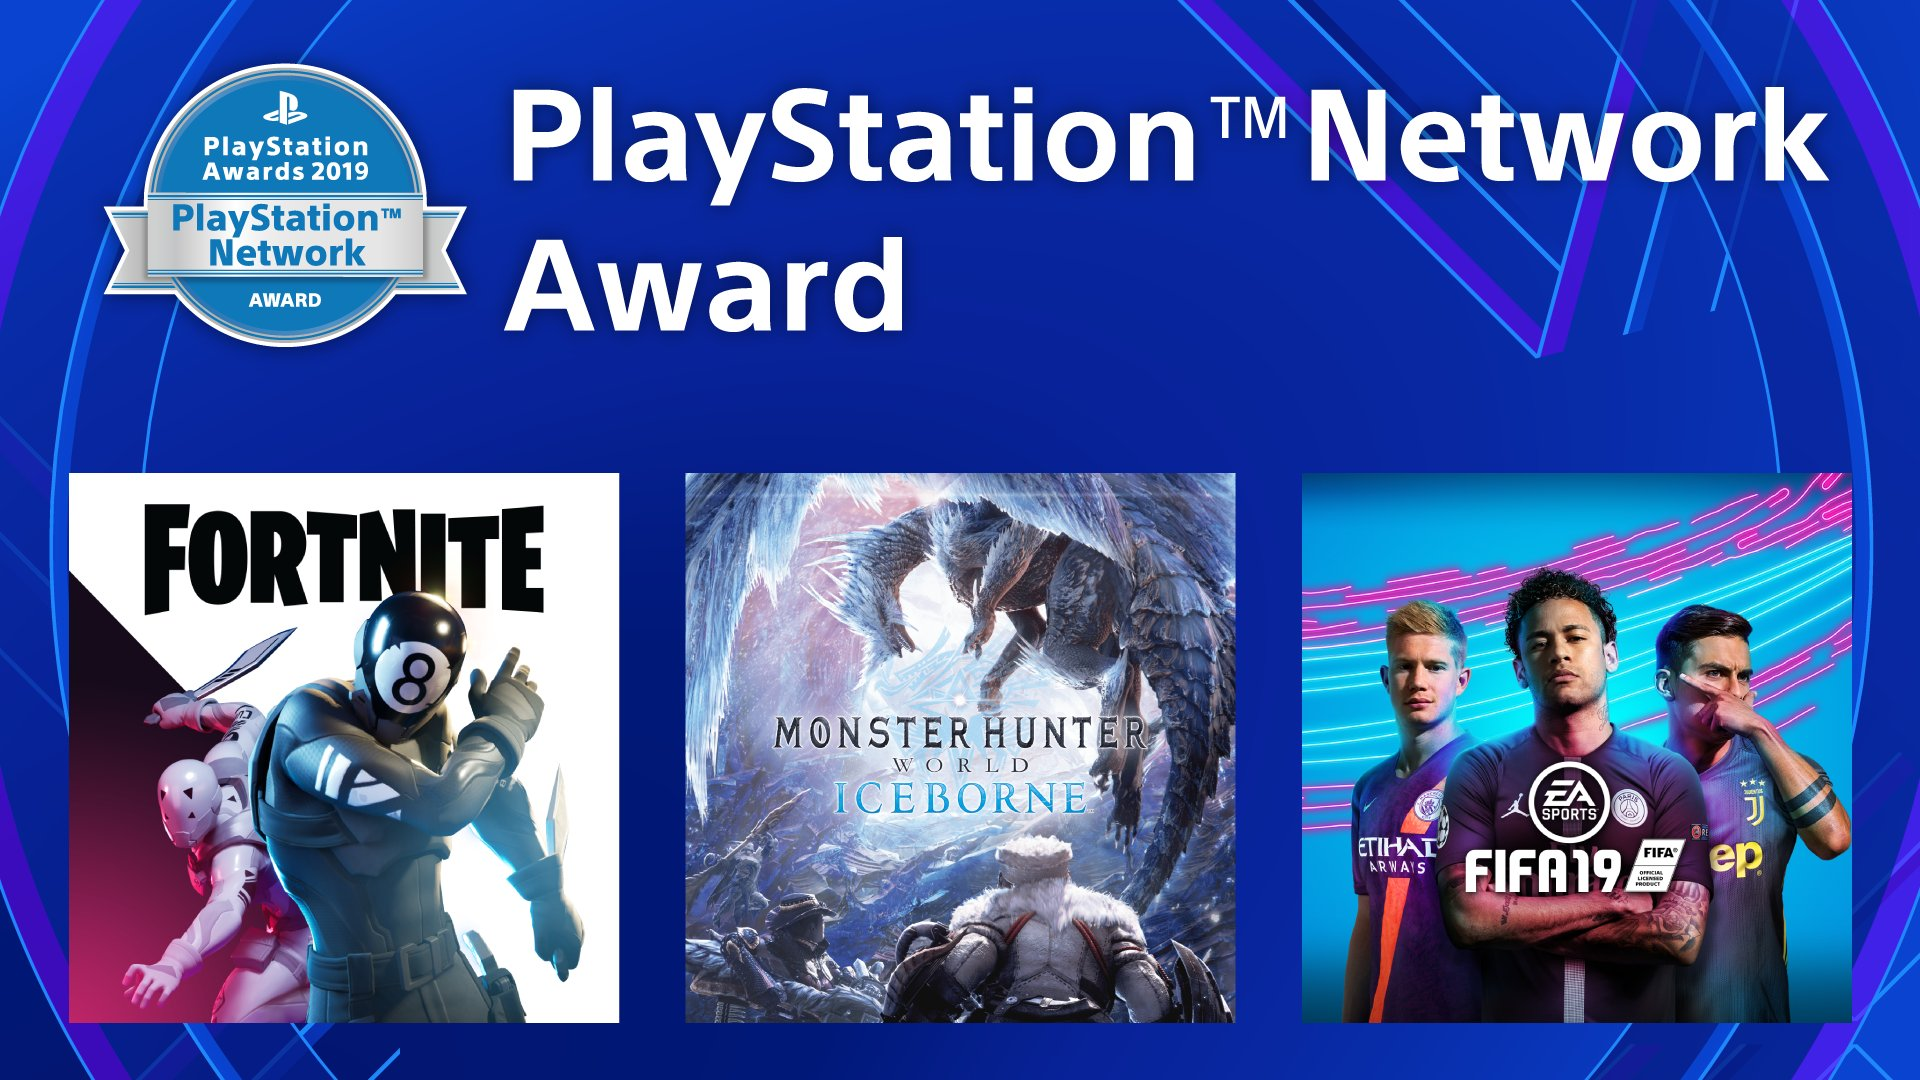 psn award 2019 - To już 25 lat - PlayStation 25th Anniversary!